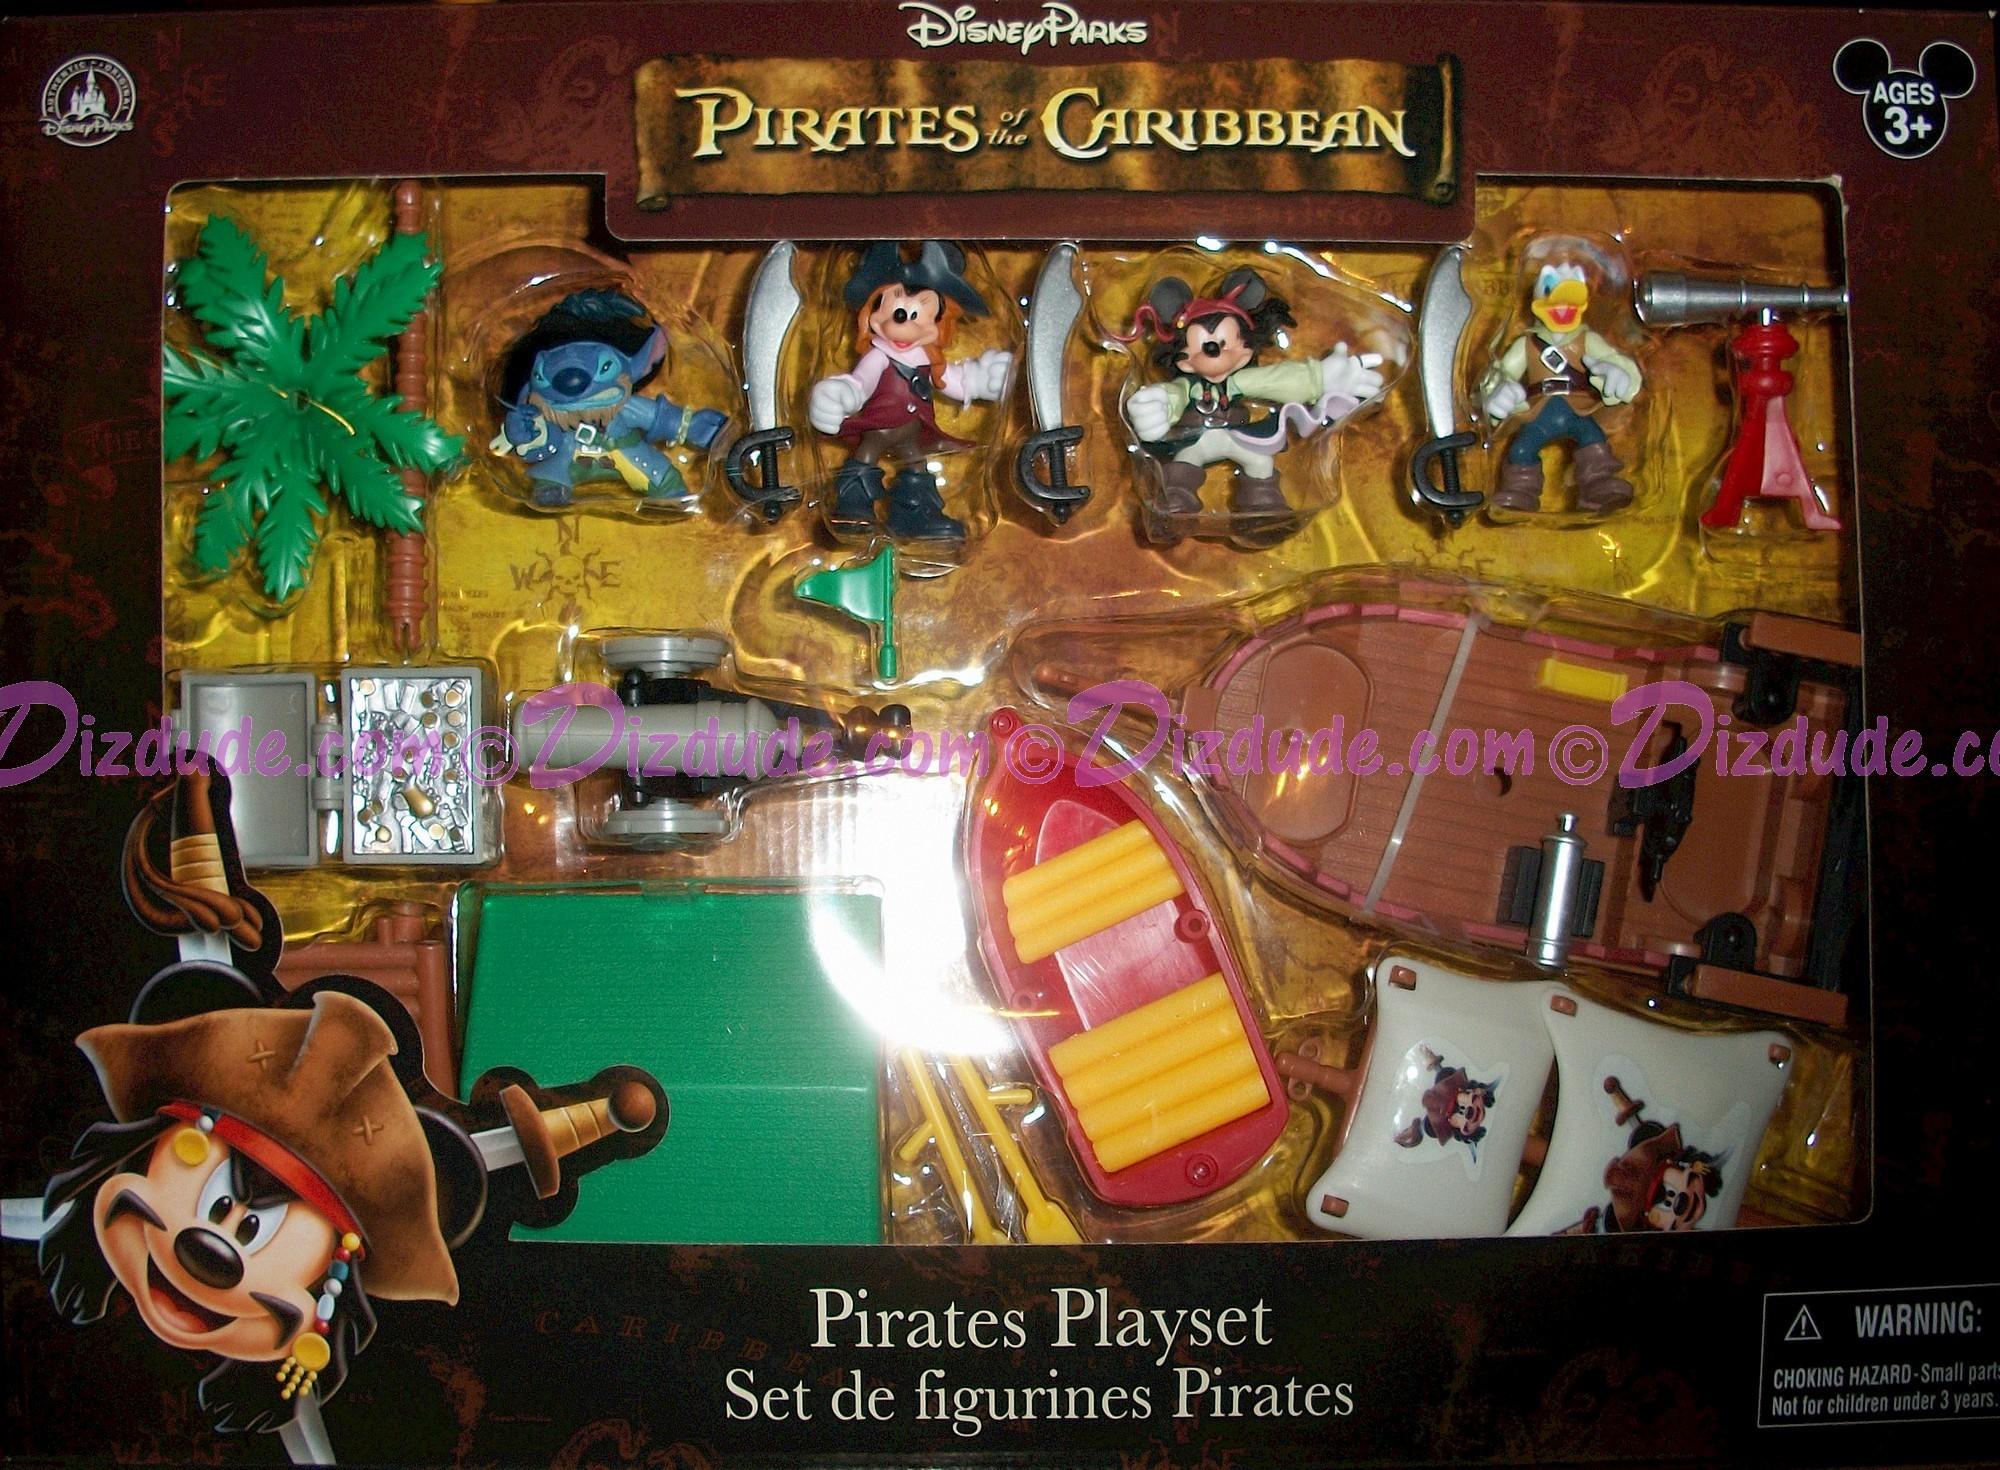 Disney's Pirates of the Caribbean Pirate Playset